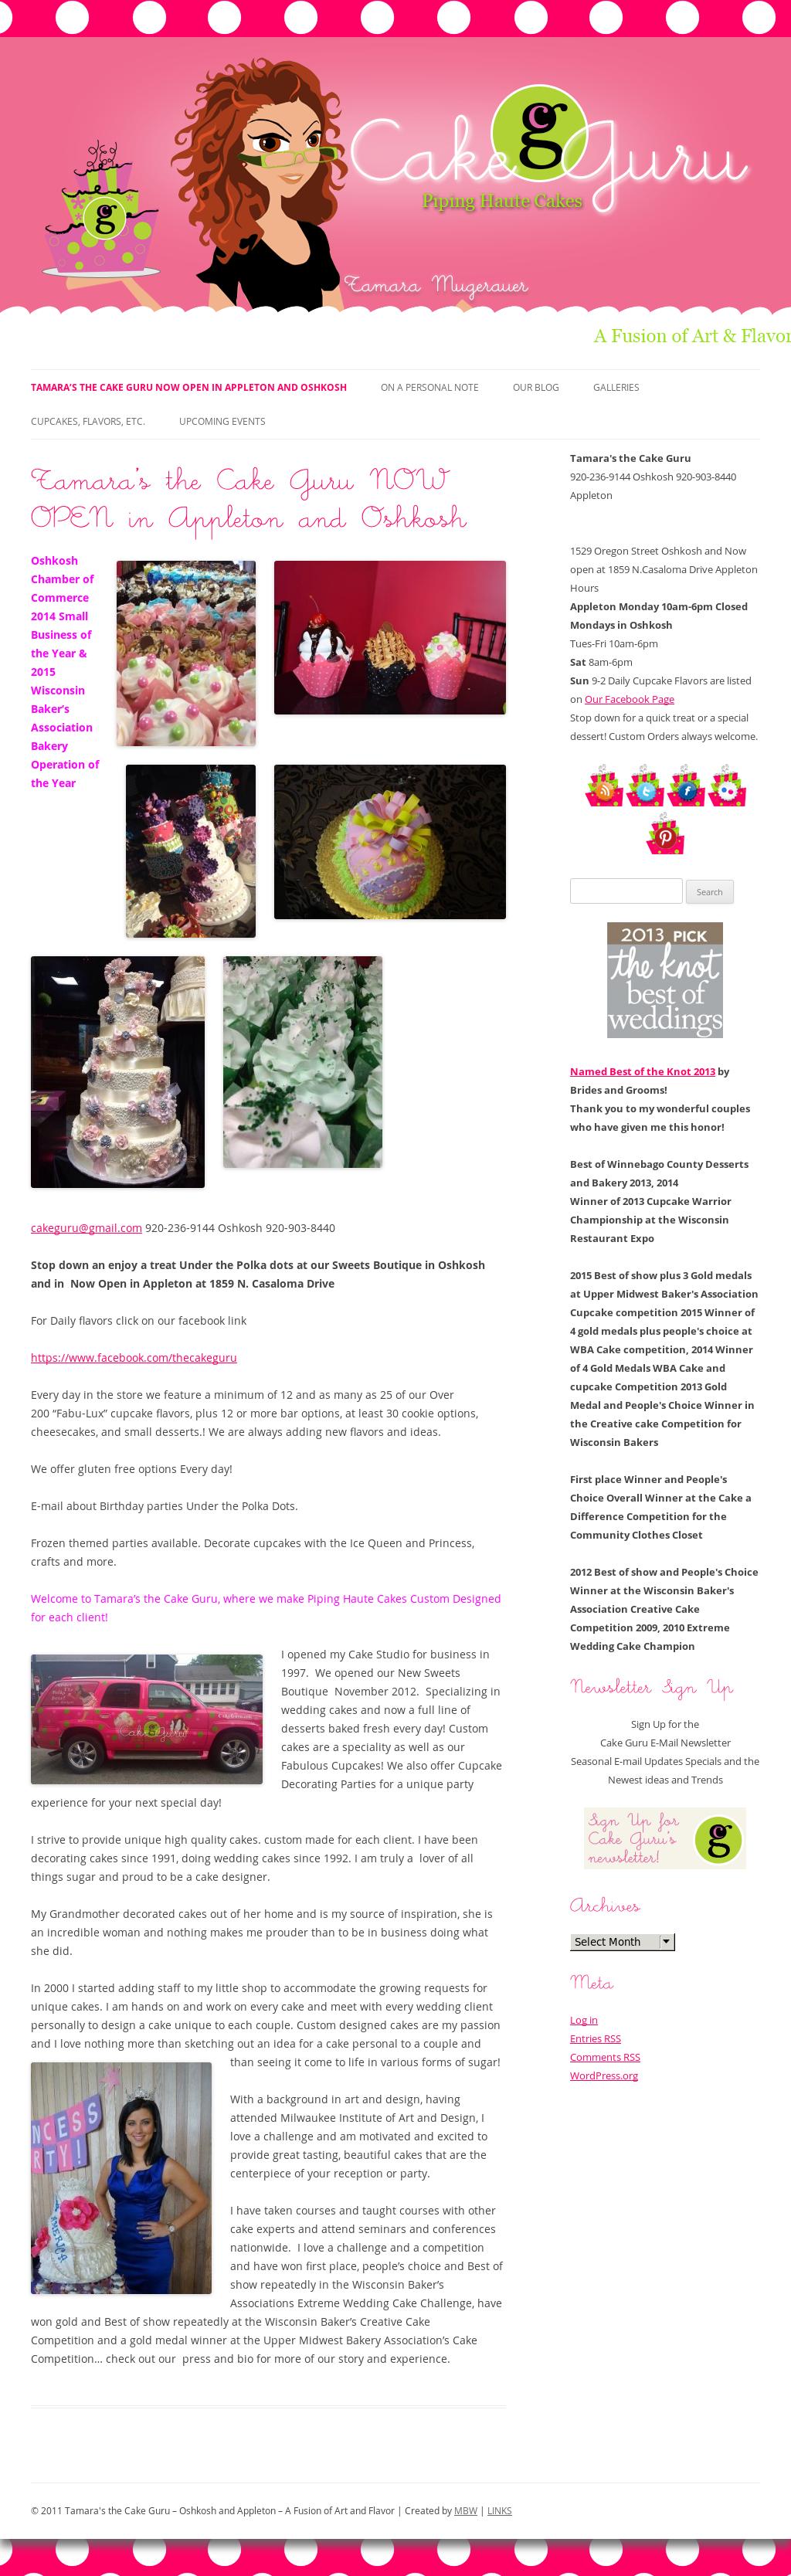 Tamara's Cakes Competitors, Revenue and Employees - Owler